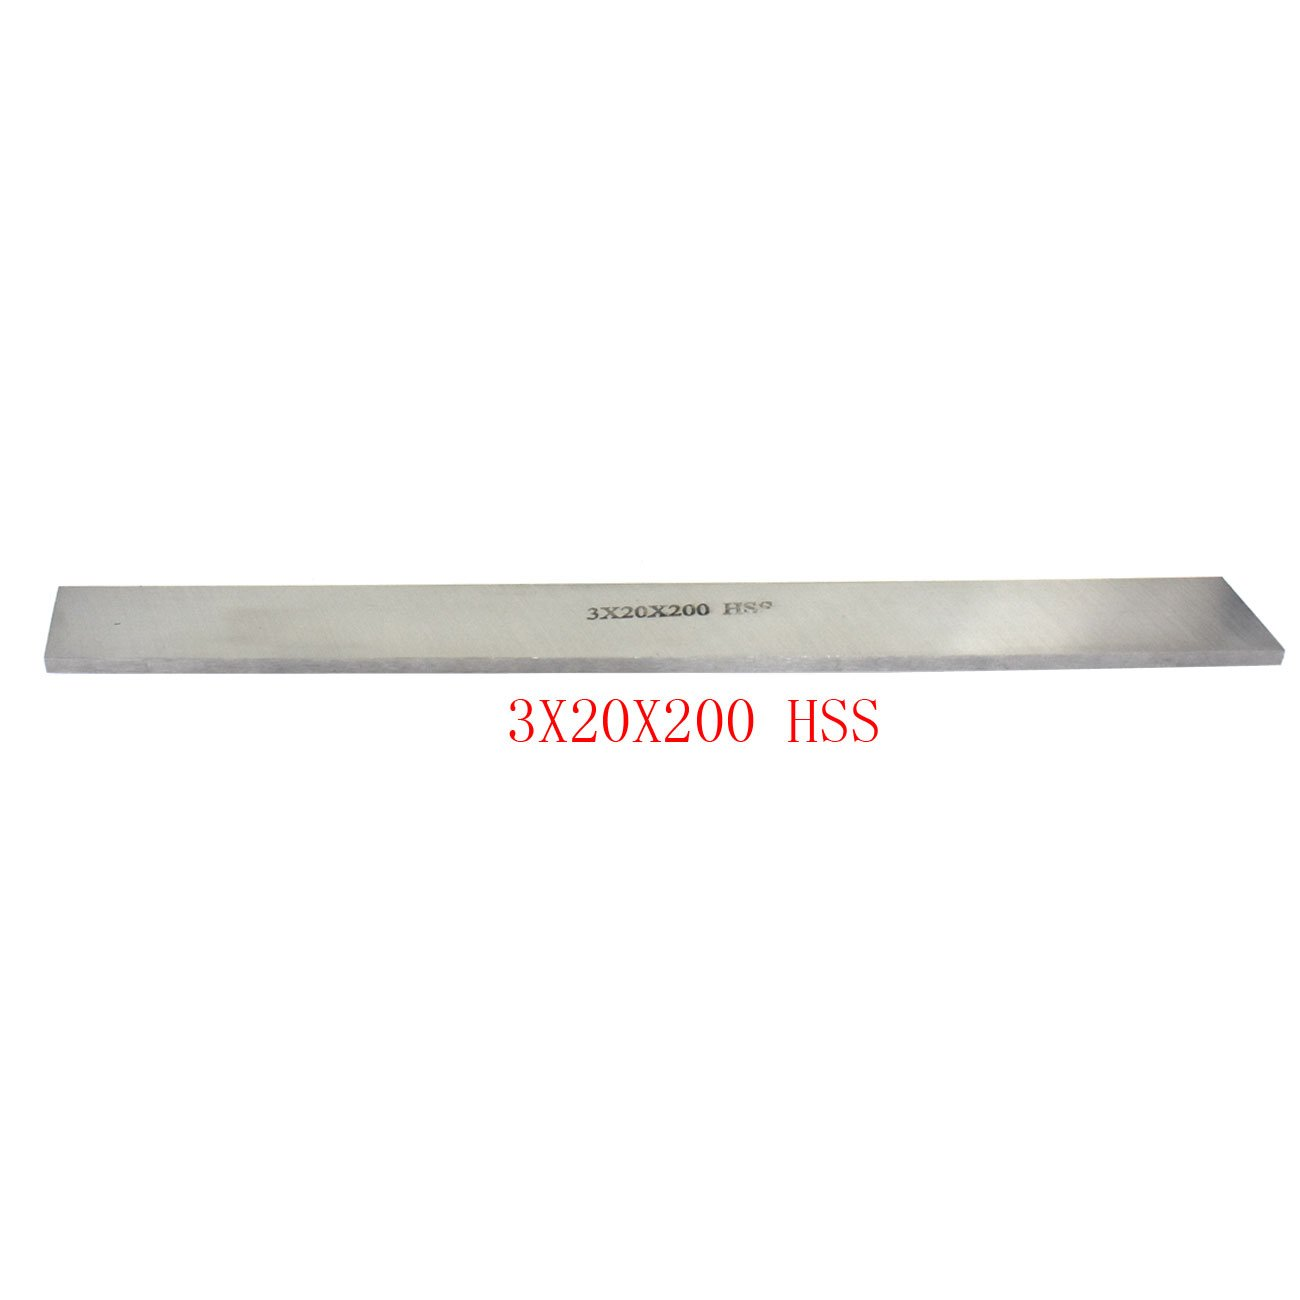 High Speed Metalworking Steel Cutting Lathe HSS Tool Bit 6mmx8mmx200mm